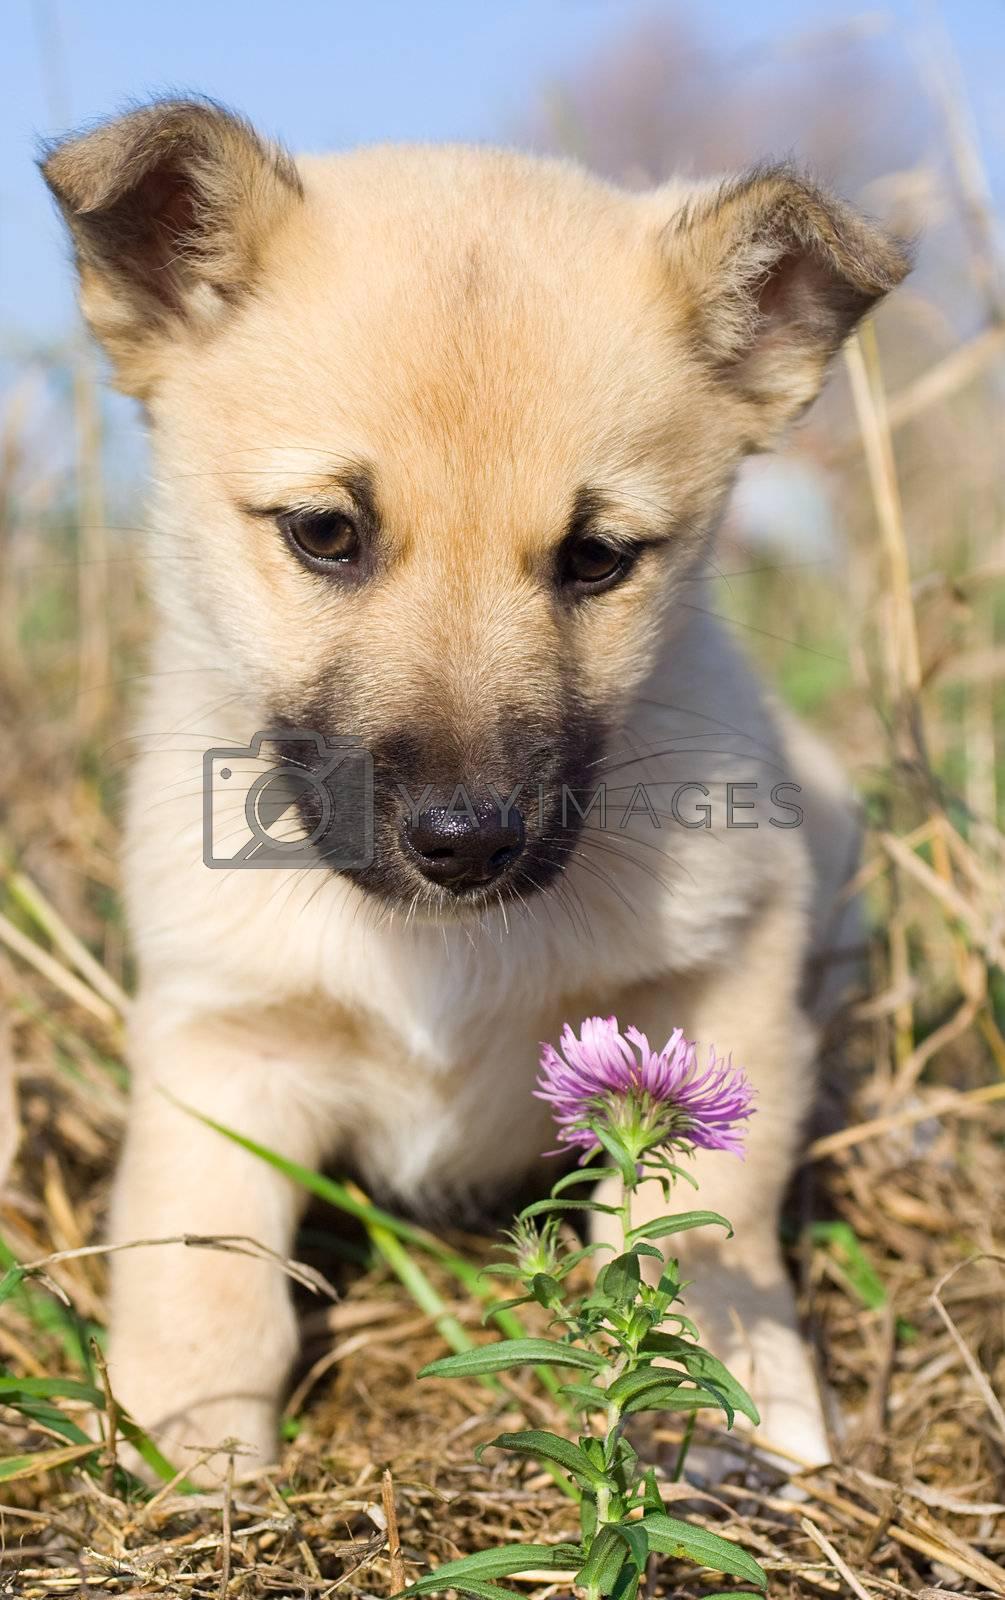 puppy smelling pink flower by Alekcey